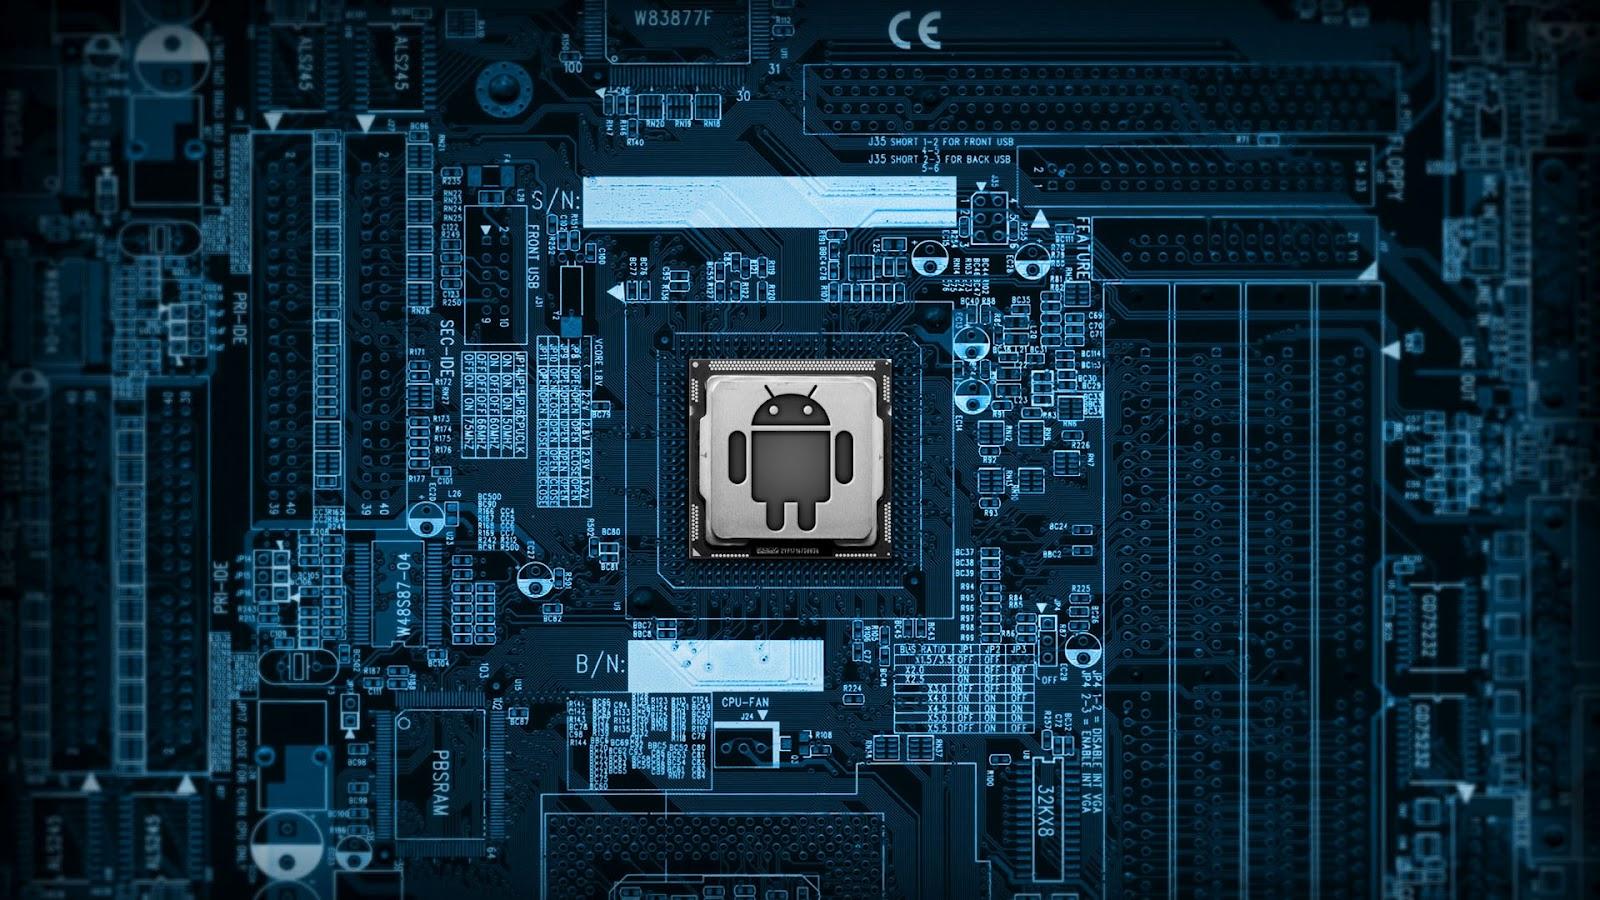 http://3.bp.blogspot.com/-LPu8g_MbFpk/T-yEXmk2EBI/AAAAAAAAAg4/ux68mPuRpYc/s1600/android%20HD%20Wallpaper%20hd%20(1).jpg